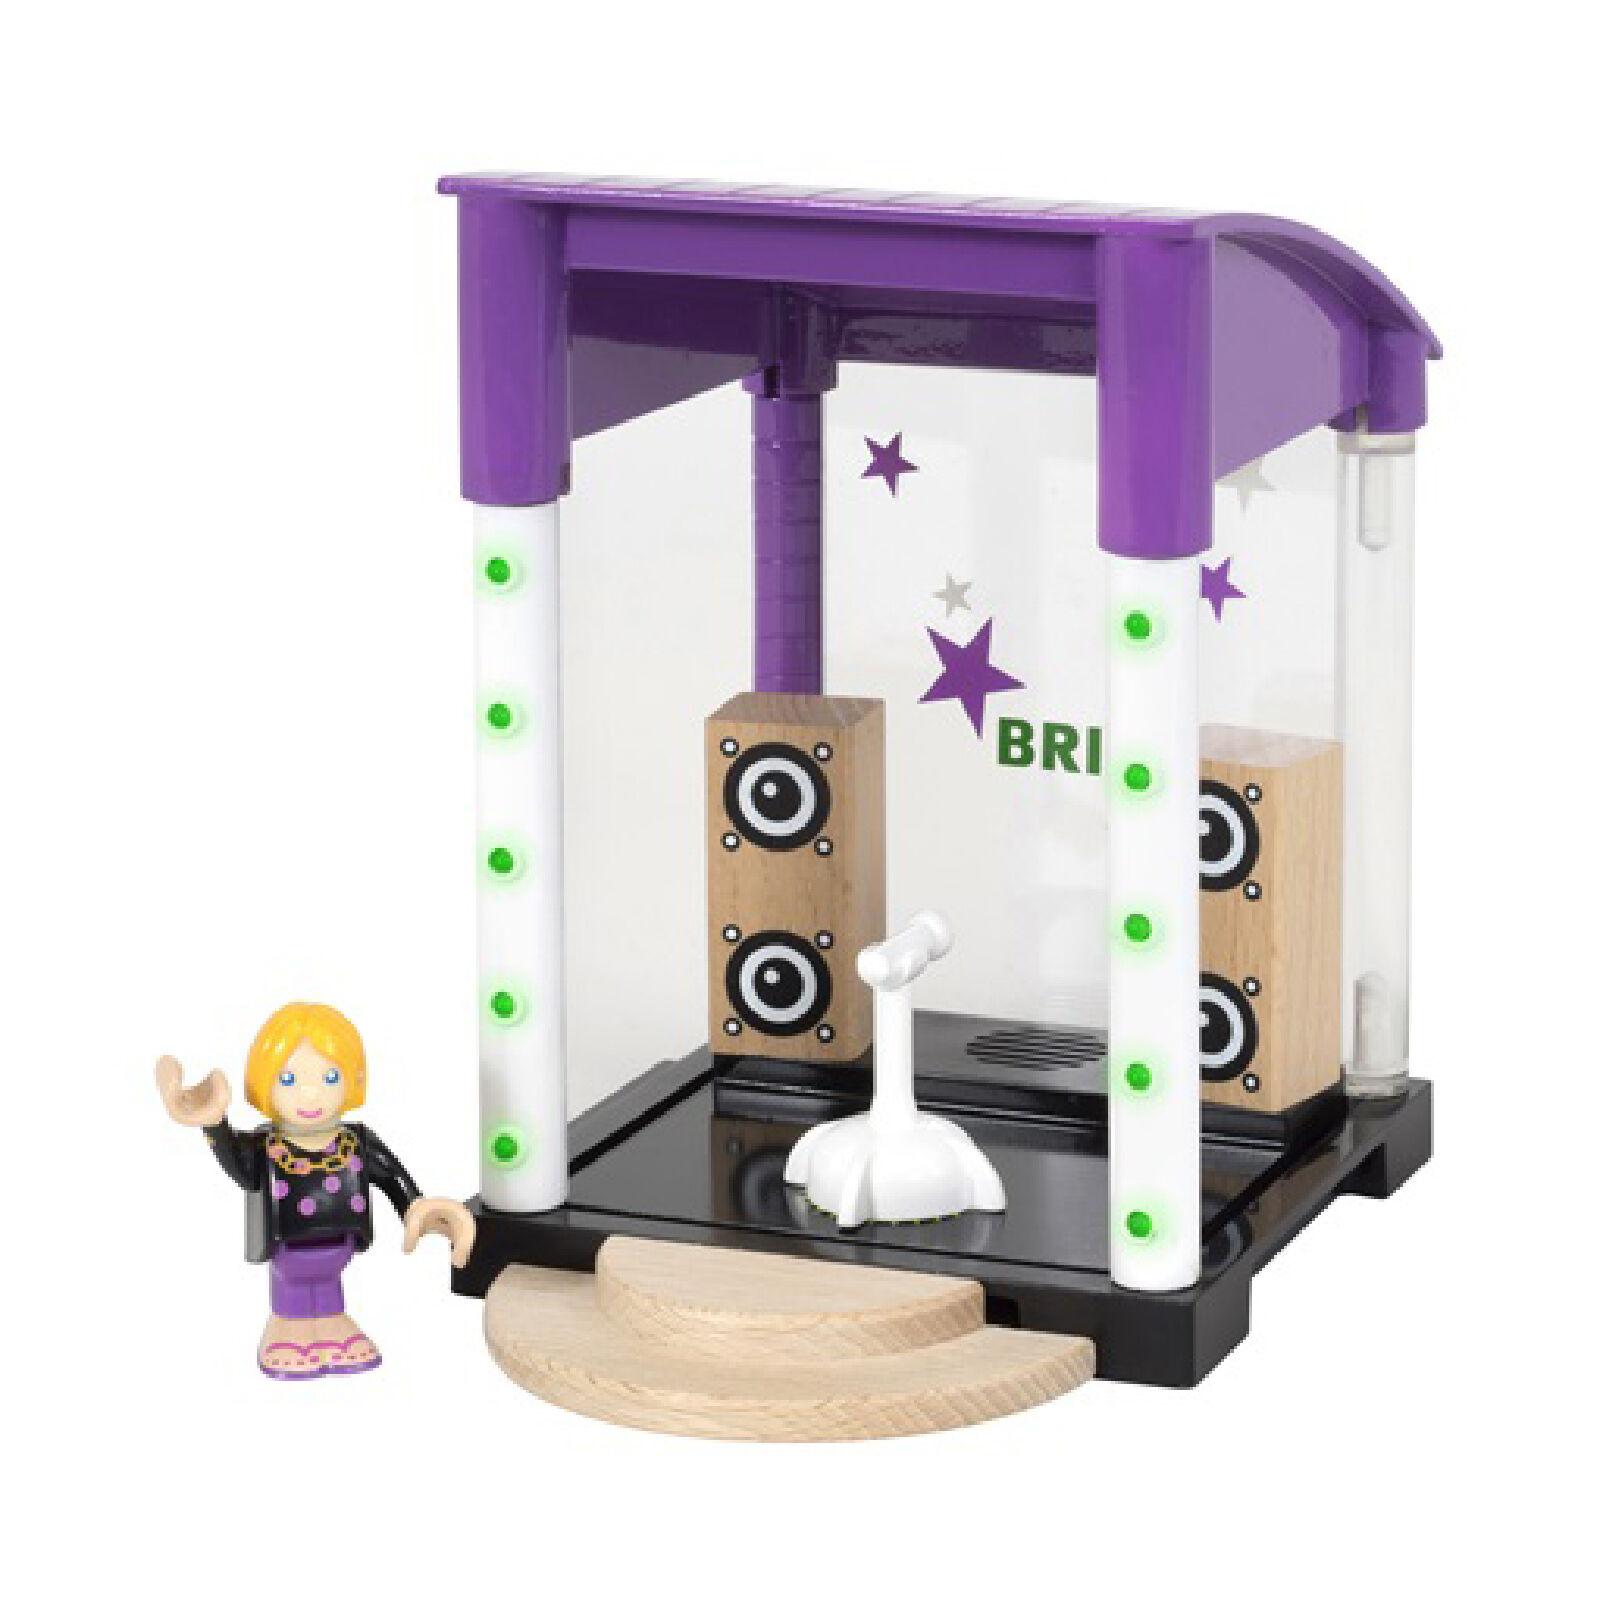 Brio Construction Toys Singing Stage